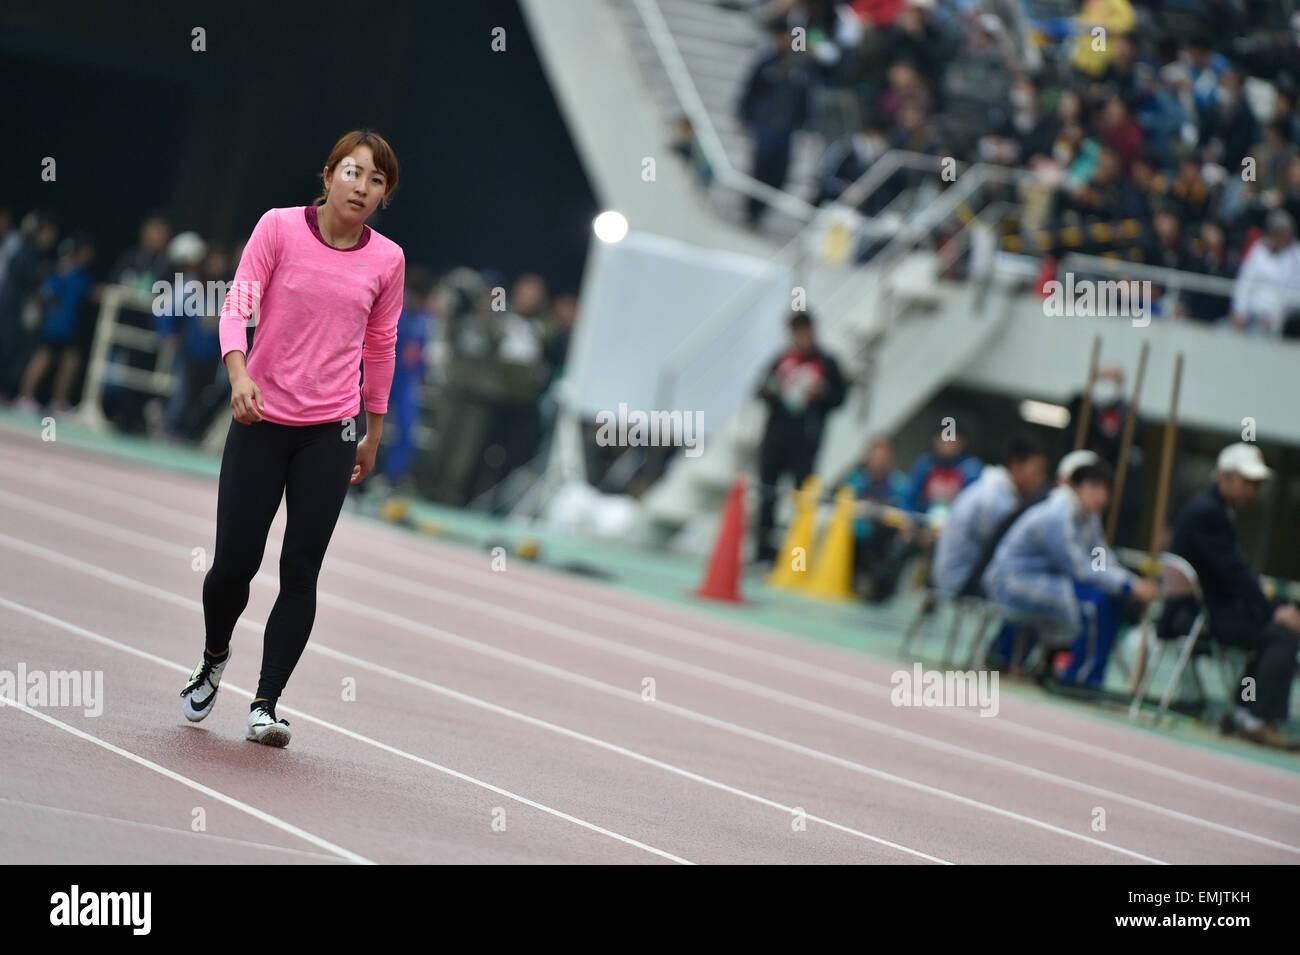 Hiroshima, Japan. 19th Apr, 2015. Anna Fujimori Athletics : The 49th Mikio Oda Memorial athletic meet JAAF Track - Stock Image